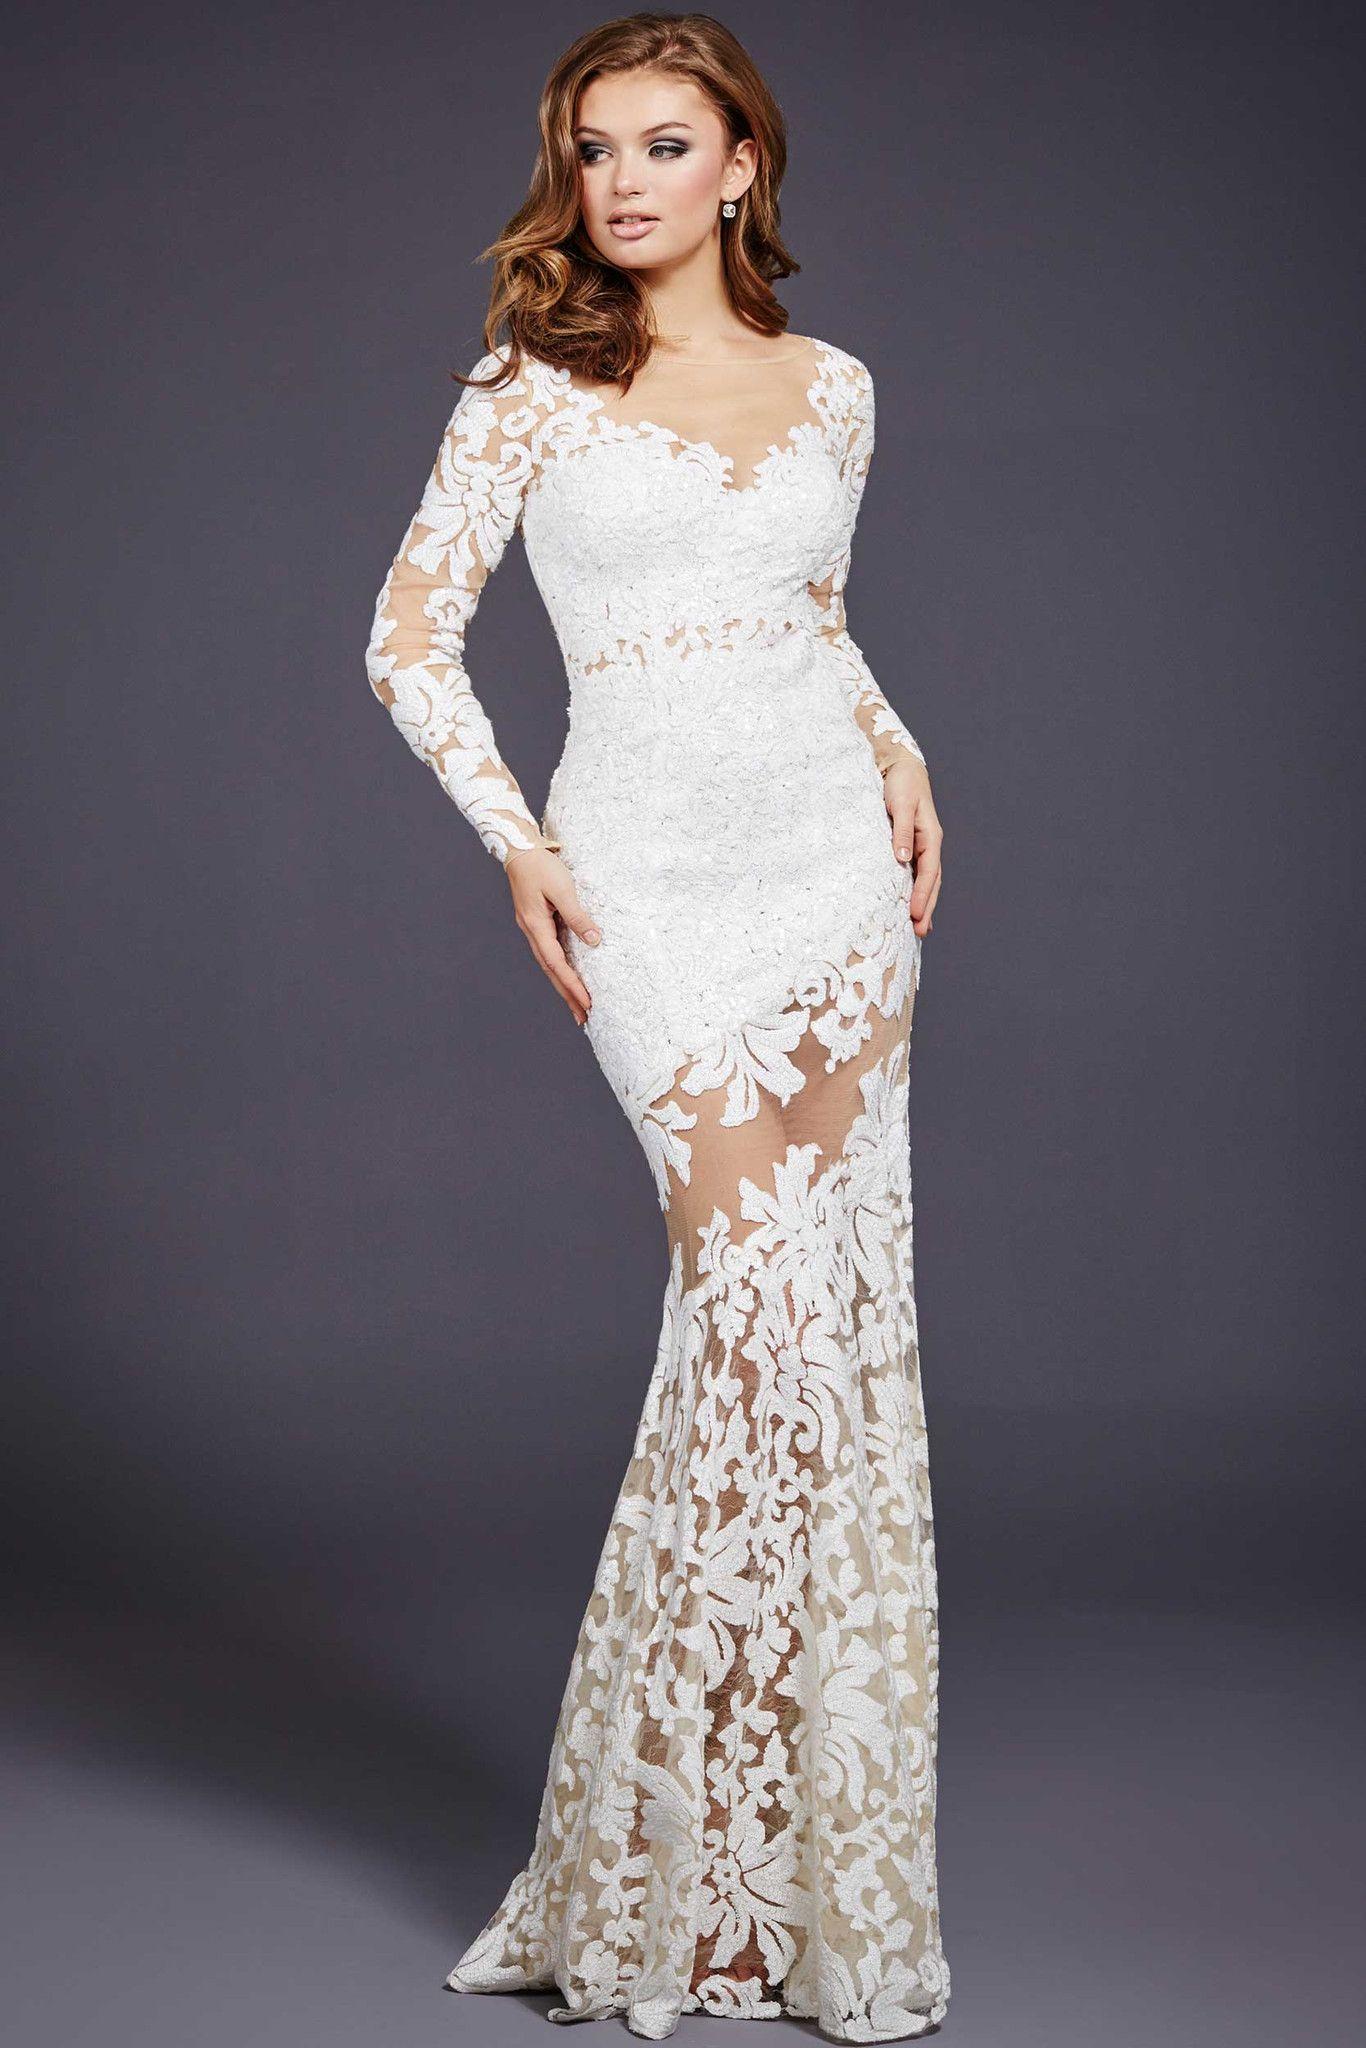 Jovani 32607 White Lace Long Sleeve Dress Prom Dresses Long With Sleeves White Long Sleeve Prom Dress [ 2048 x 1366 Pixel ]